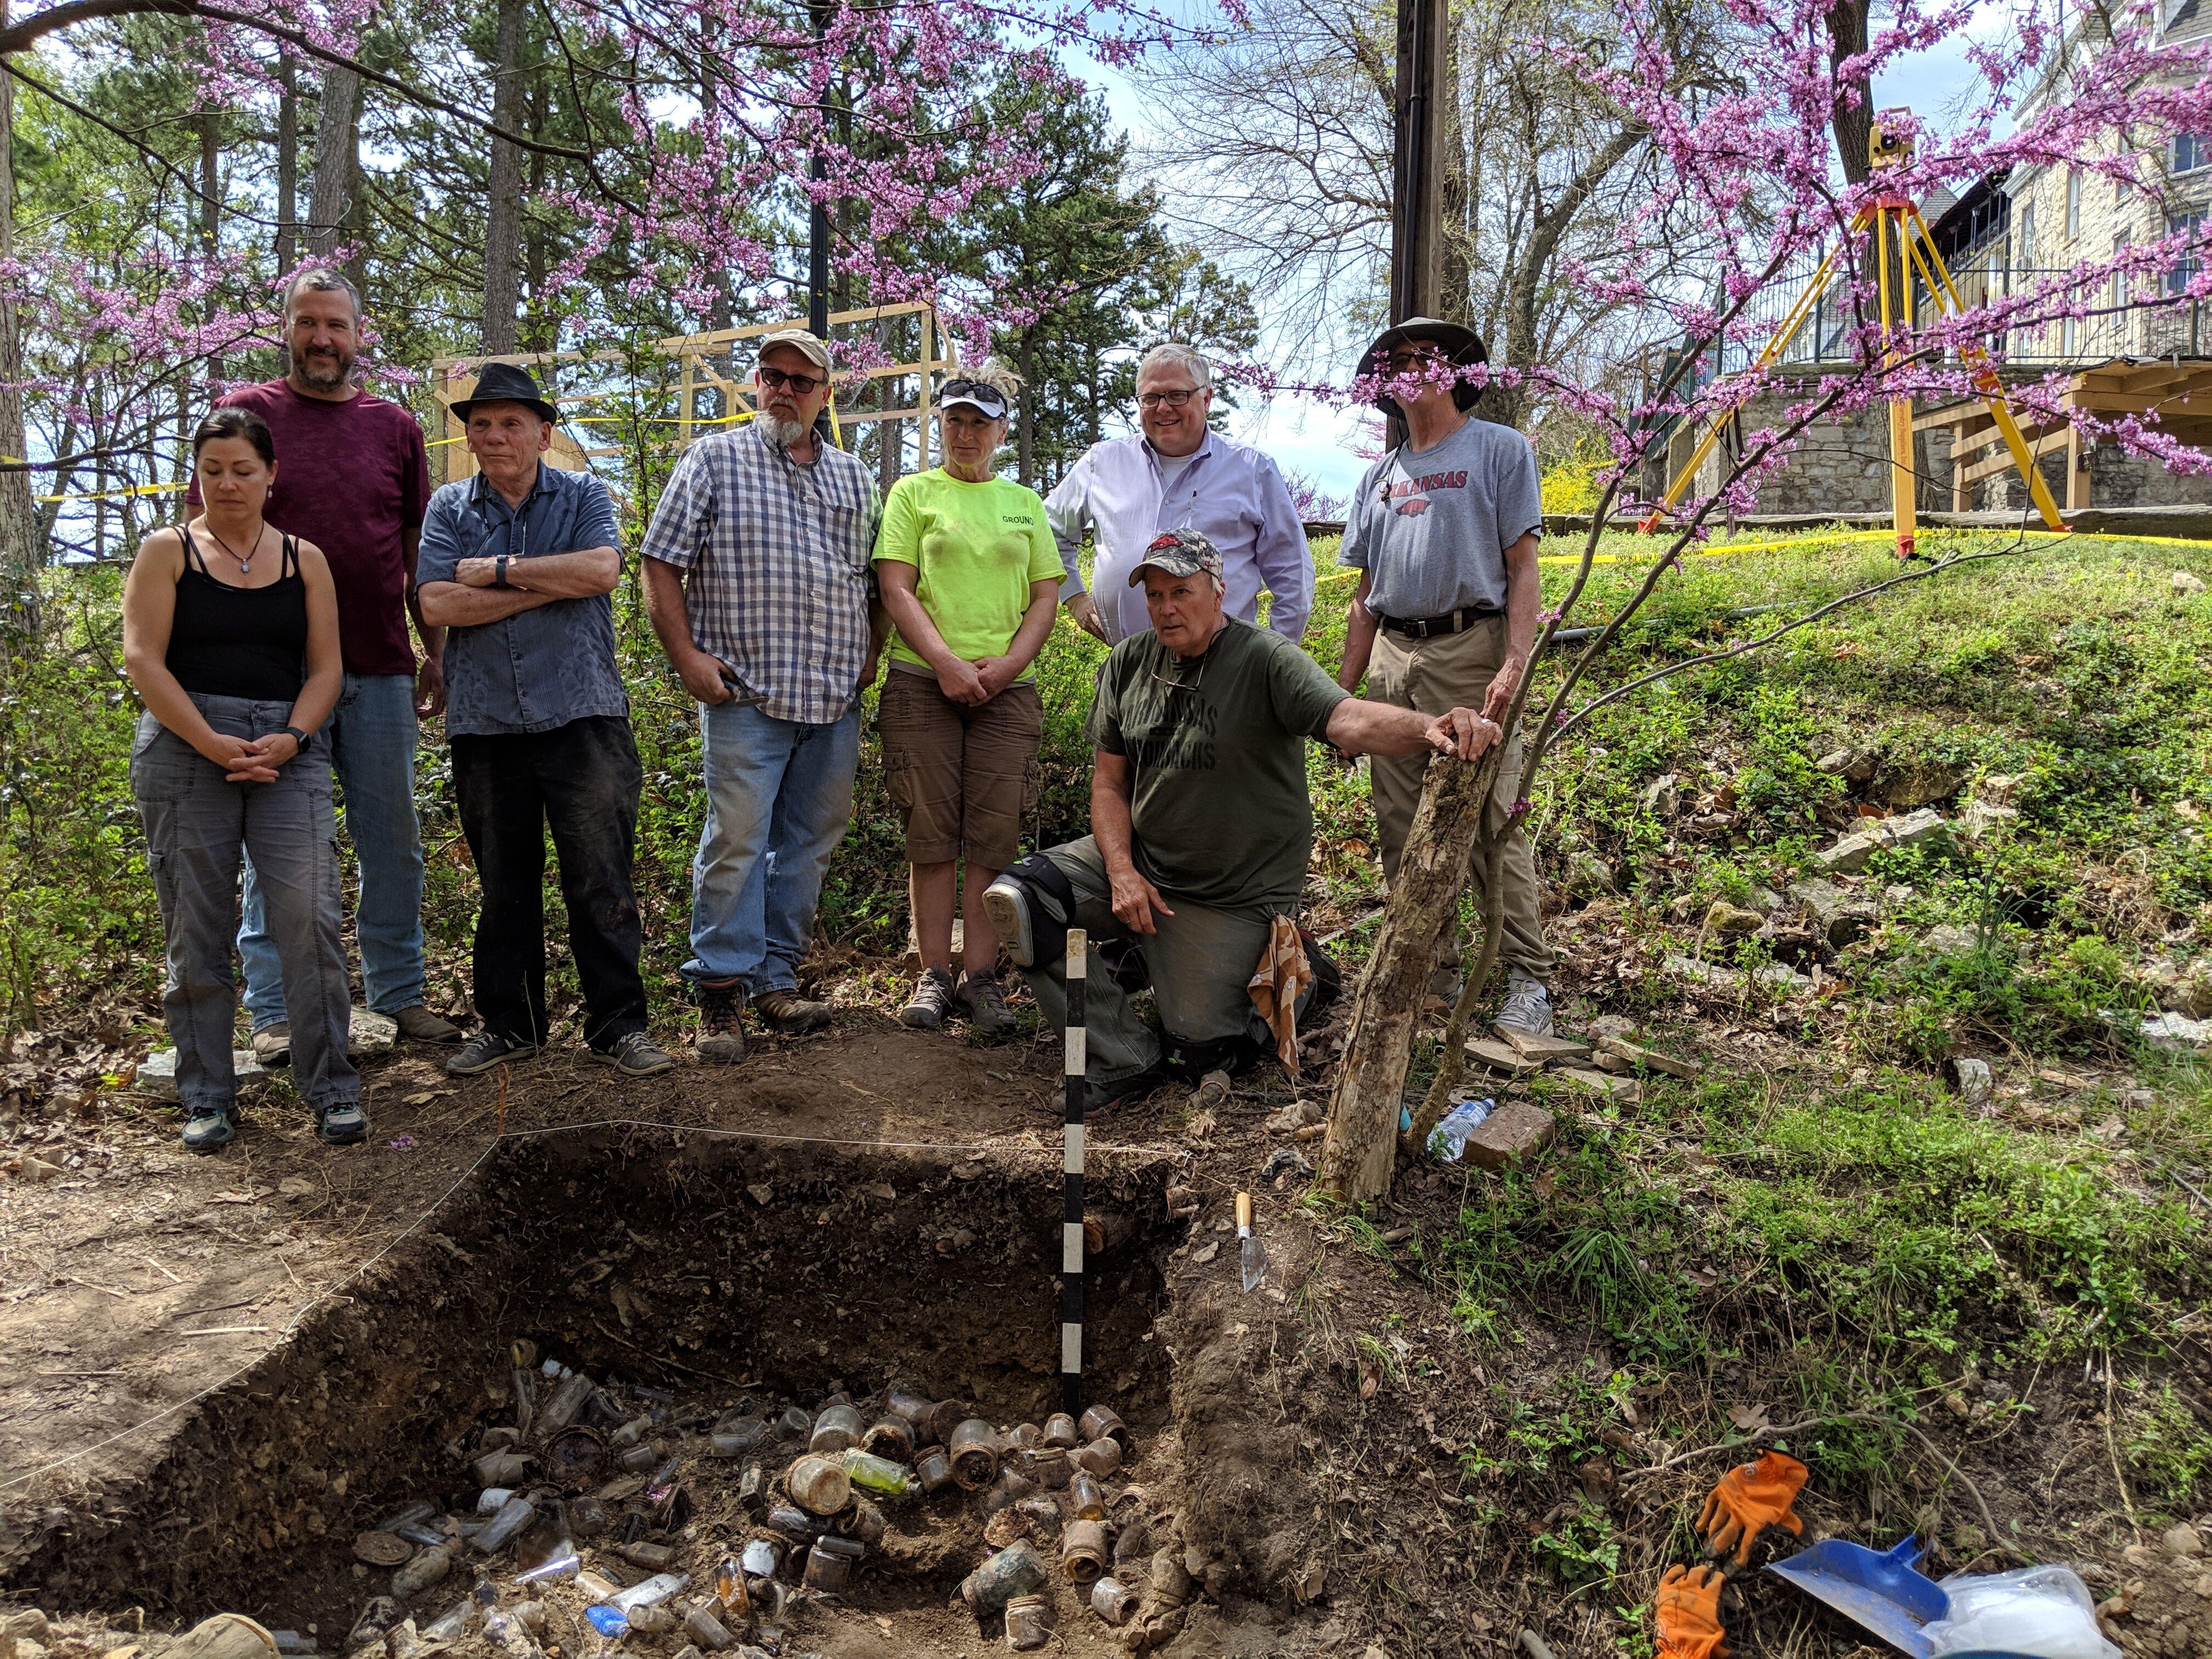 Digging up hotel history in Eureka Springs